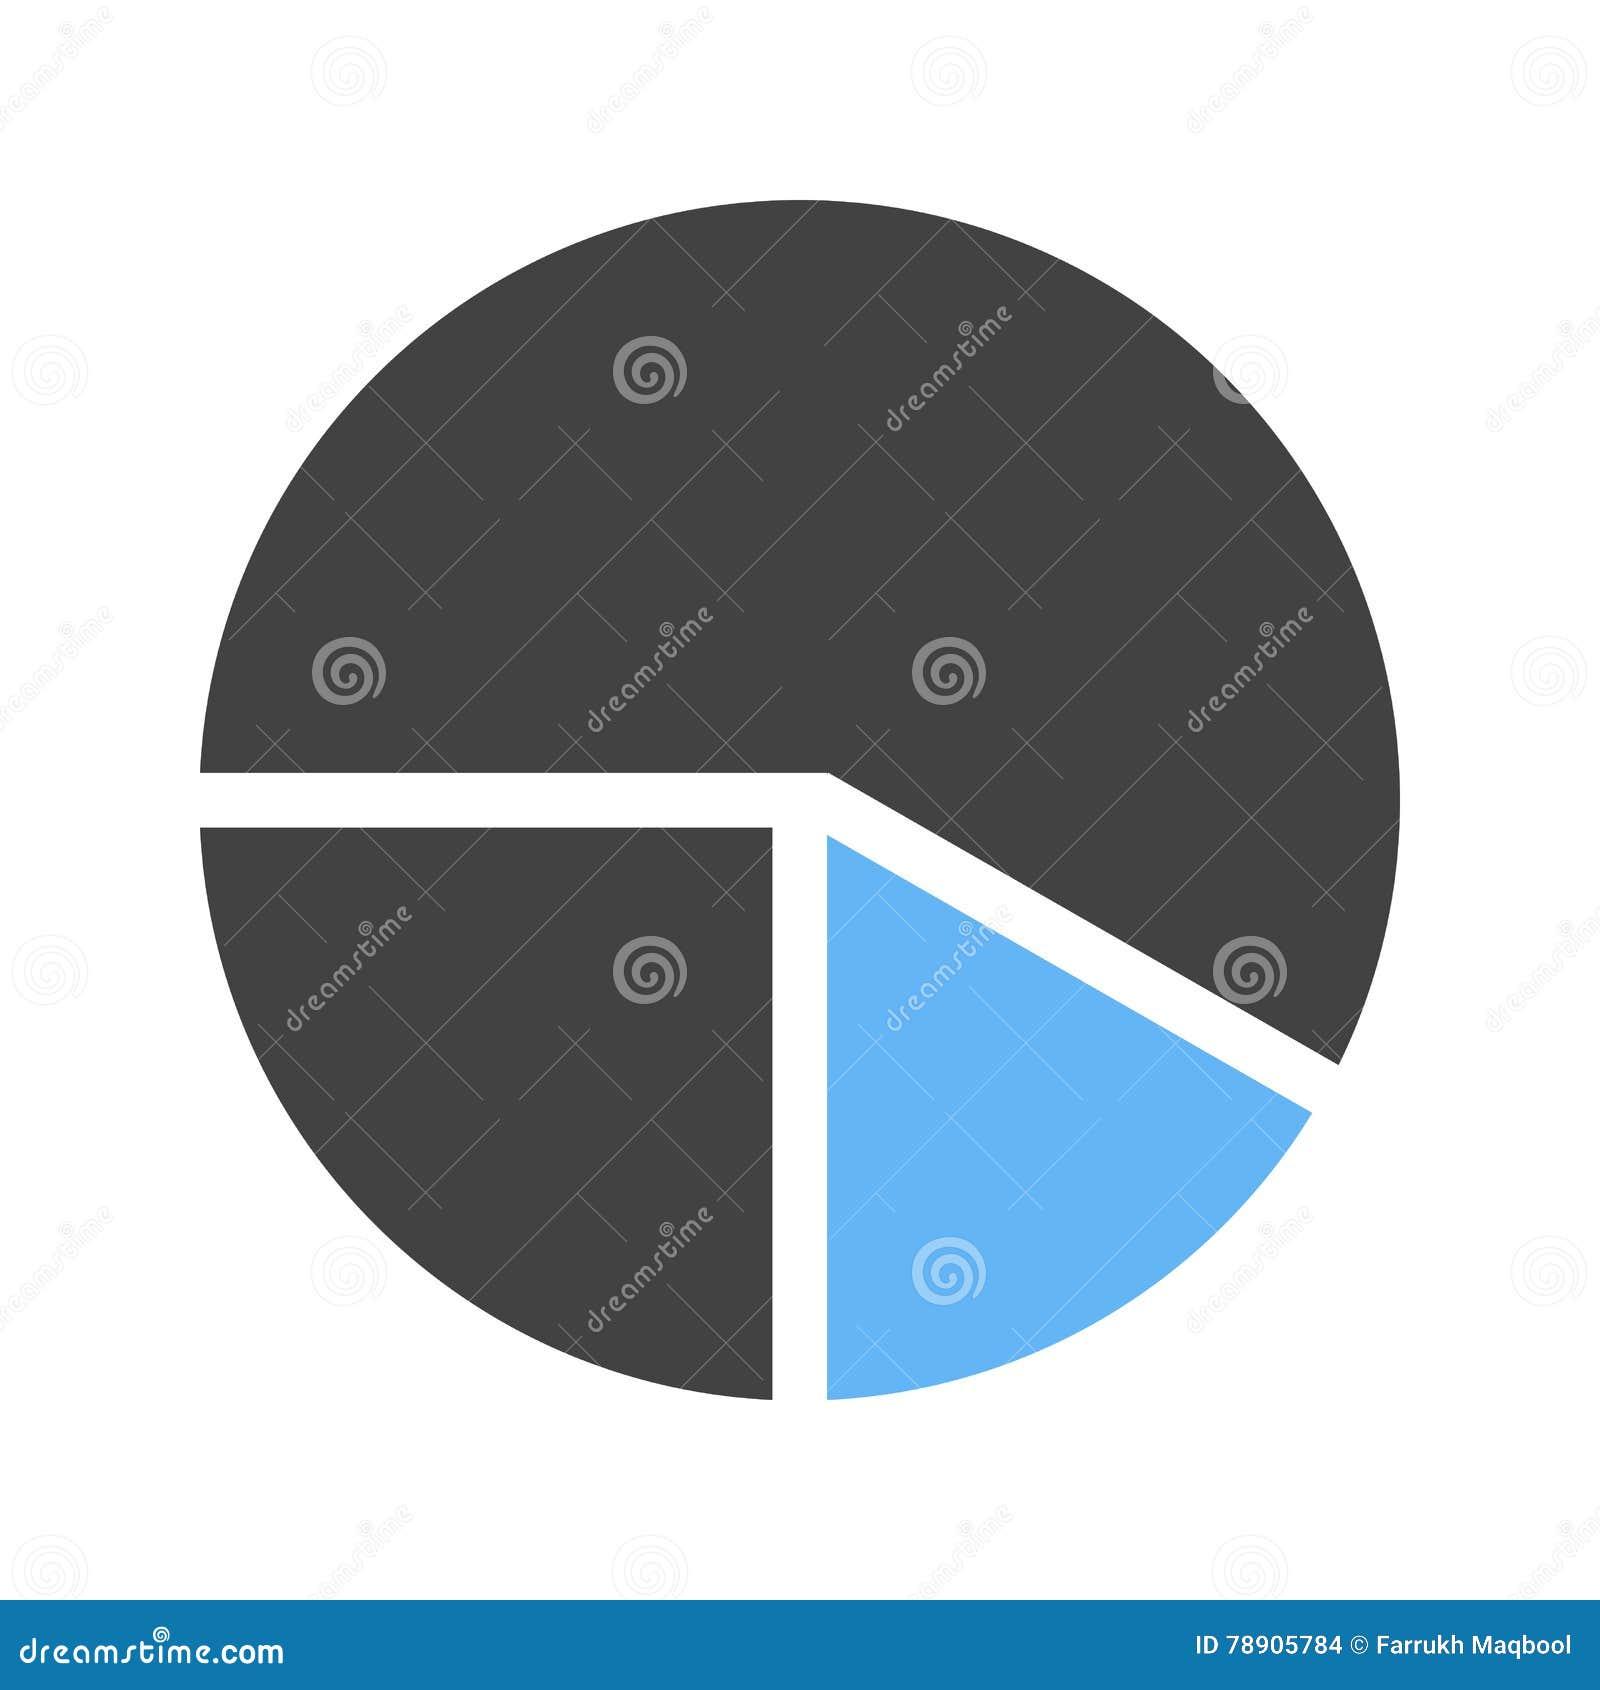 Pie Chart Analysis Stock Vector Illustration Of Analysis 78905784